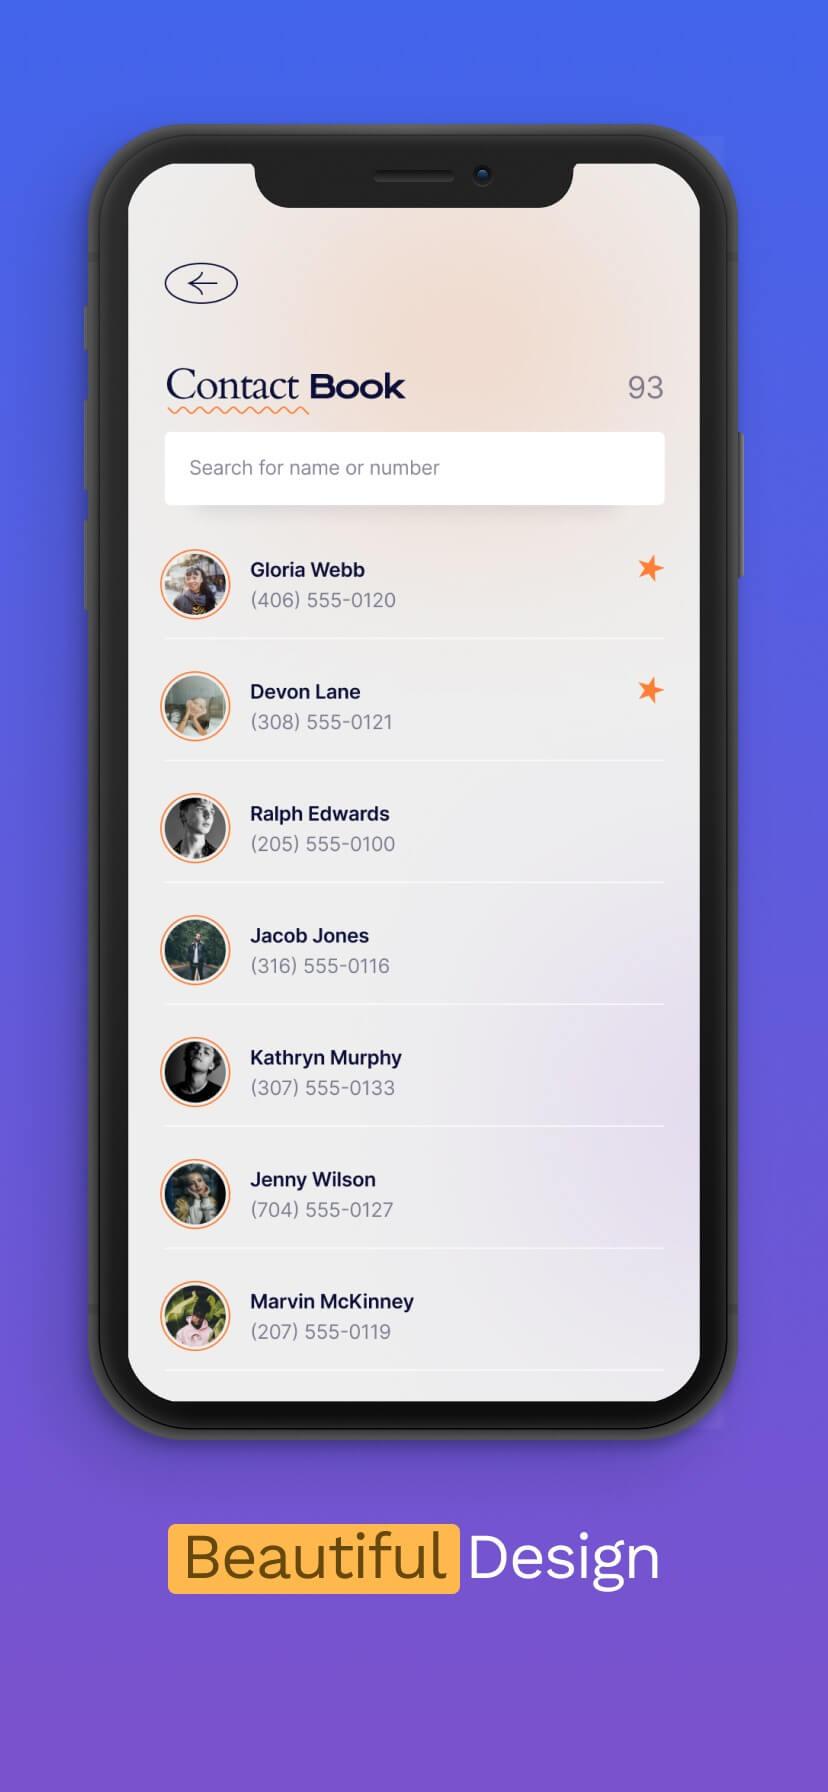 Blue and purple gradient app store screenshot #5